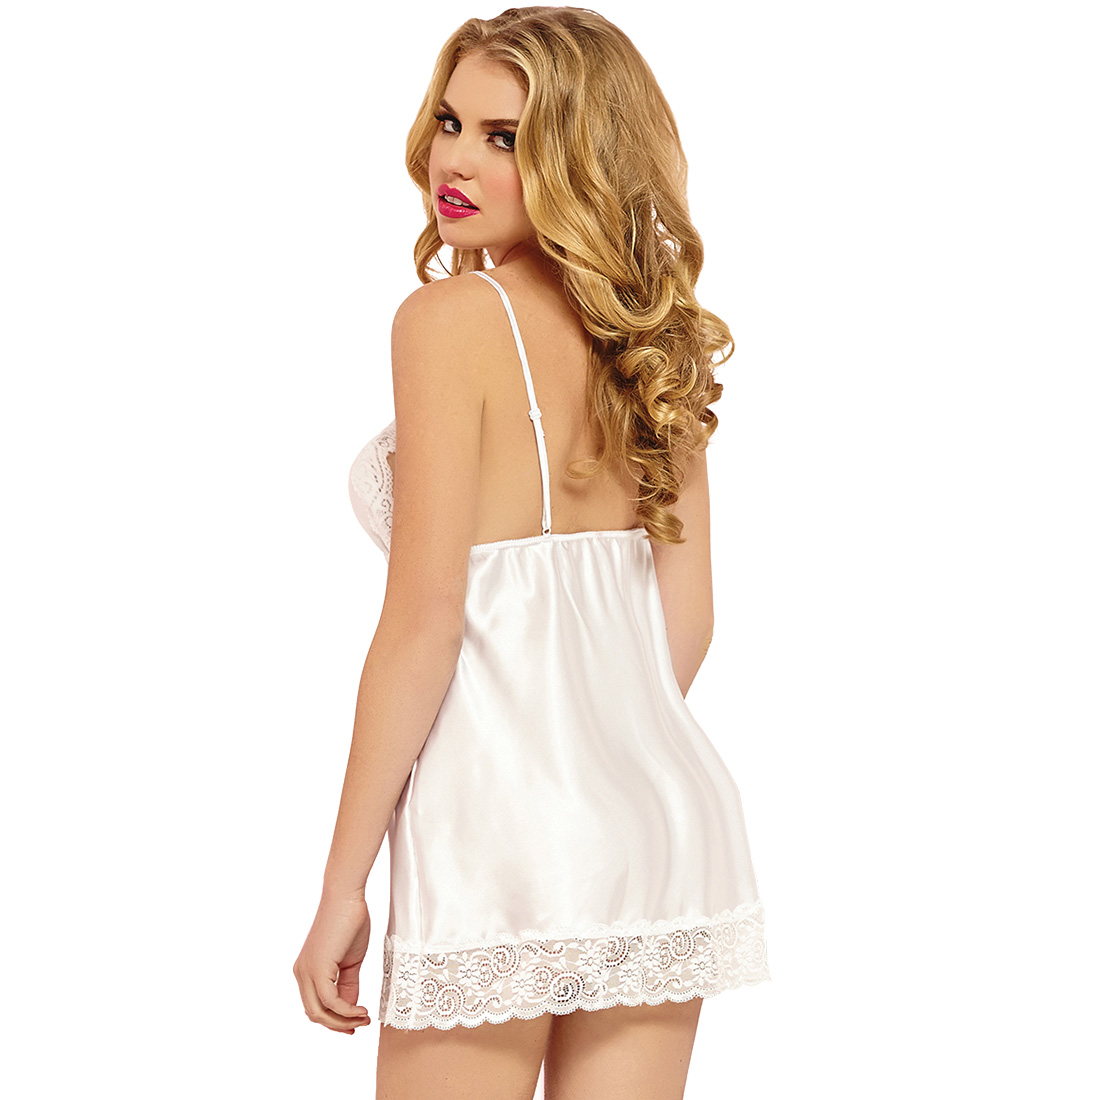 White Womens Satin Robes Bridal Bridesmaid Wedding Robe Silk Lace ... dda48791b